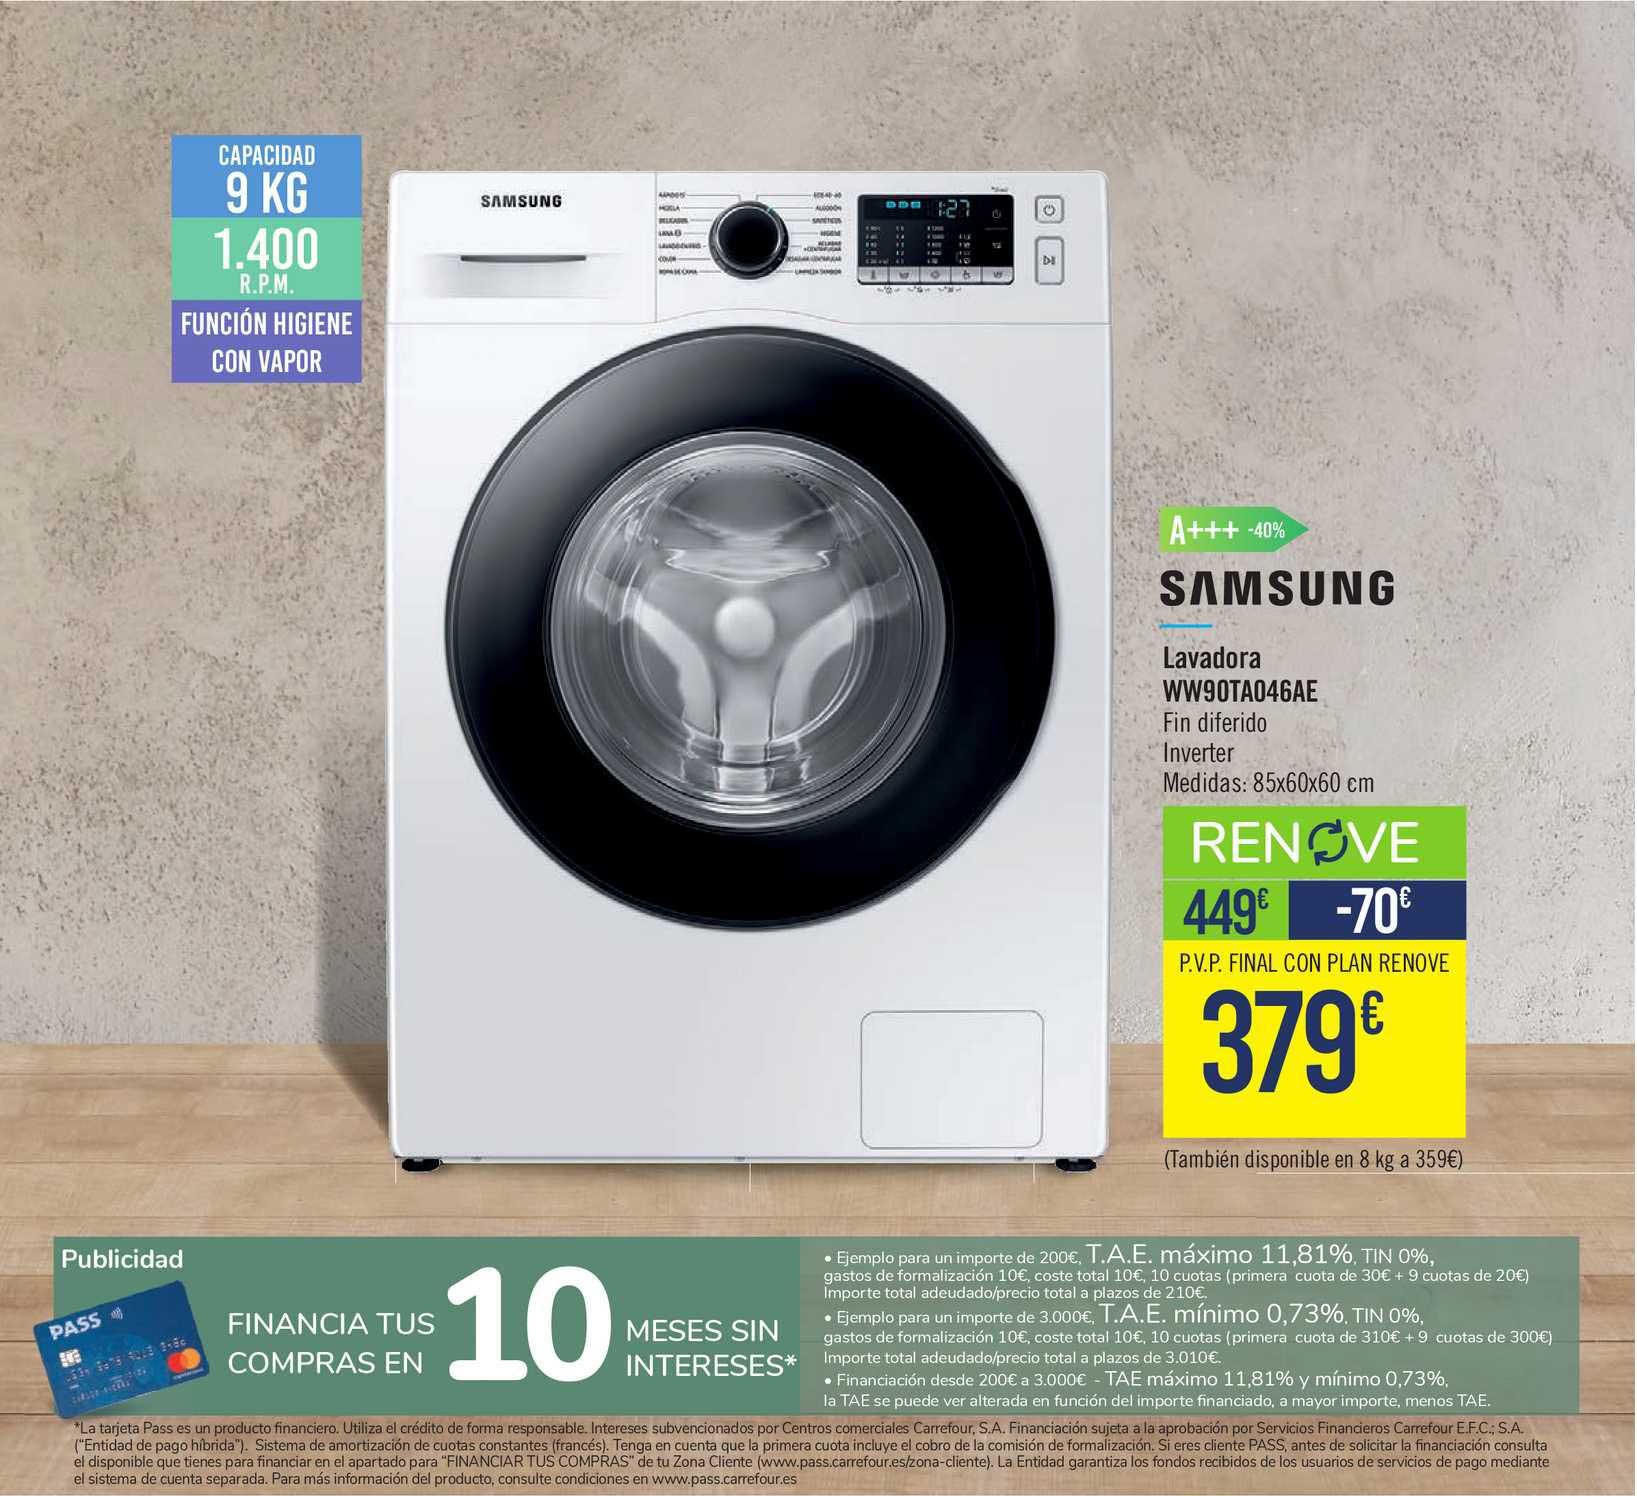 Carrefour Samsung Lavadora Ww90ta046ae